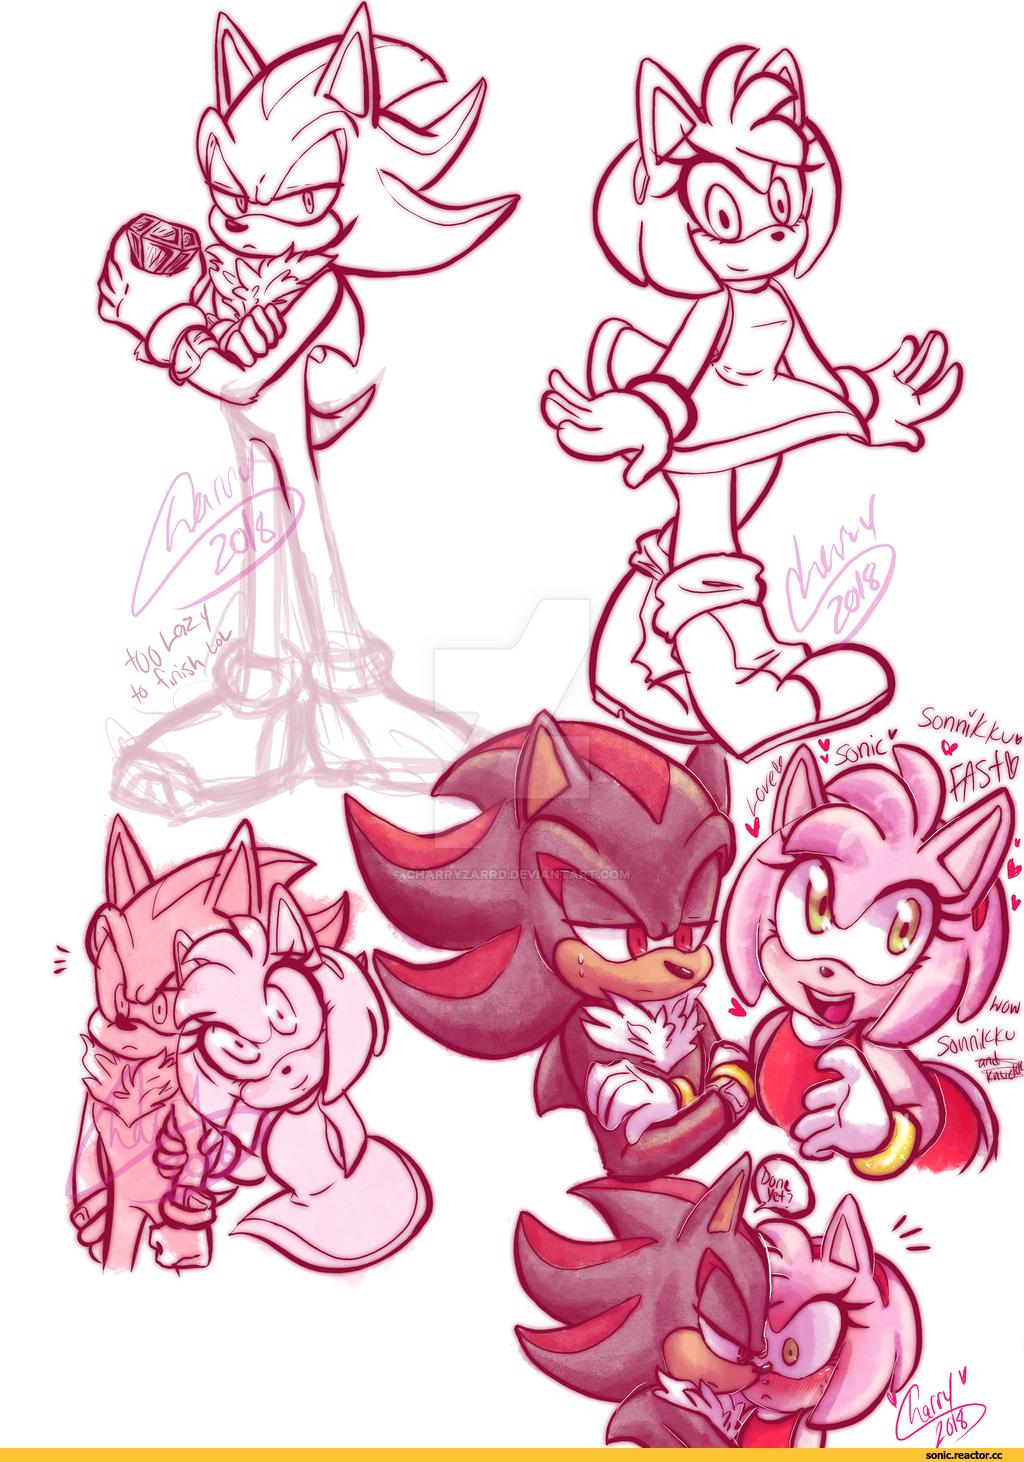 Sonic,соник, Sonic the hedgehog, ,фэндомы,Shadow the hedgehog,StH Персонажи,Amy Rose,Shadamy,StH art,StH Пейринги